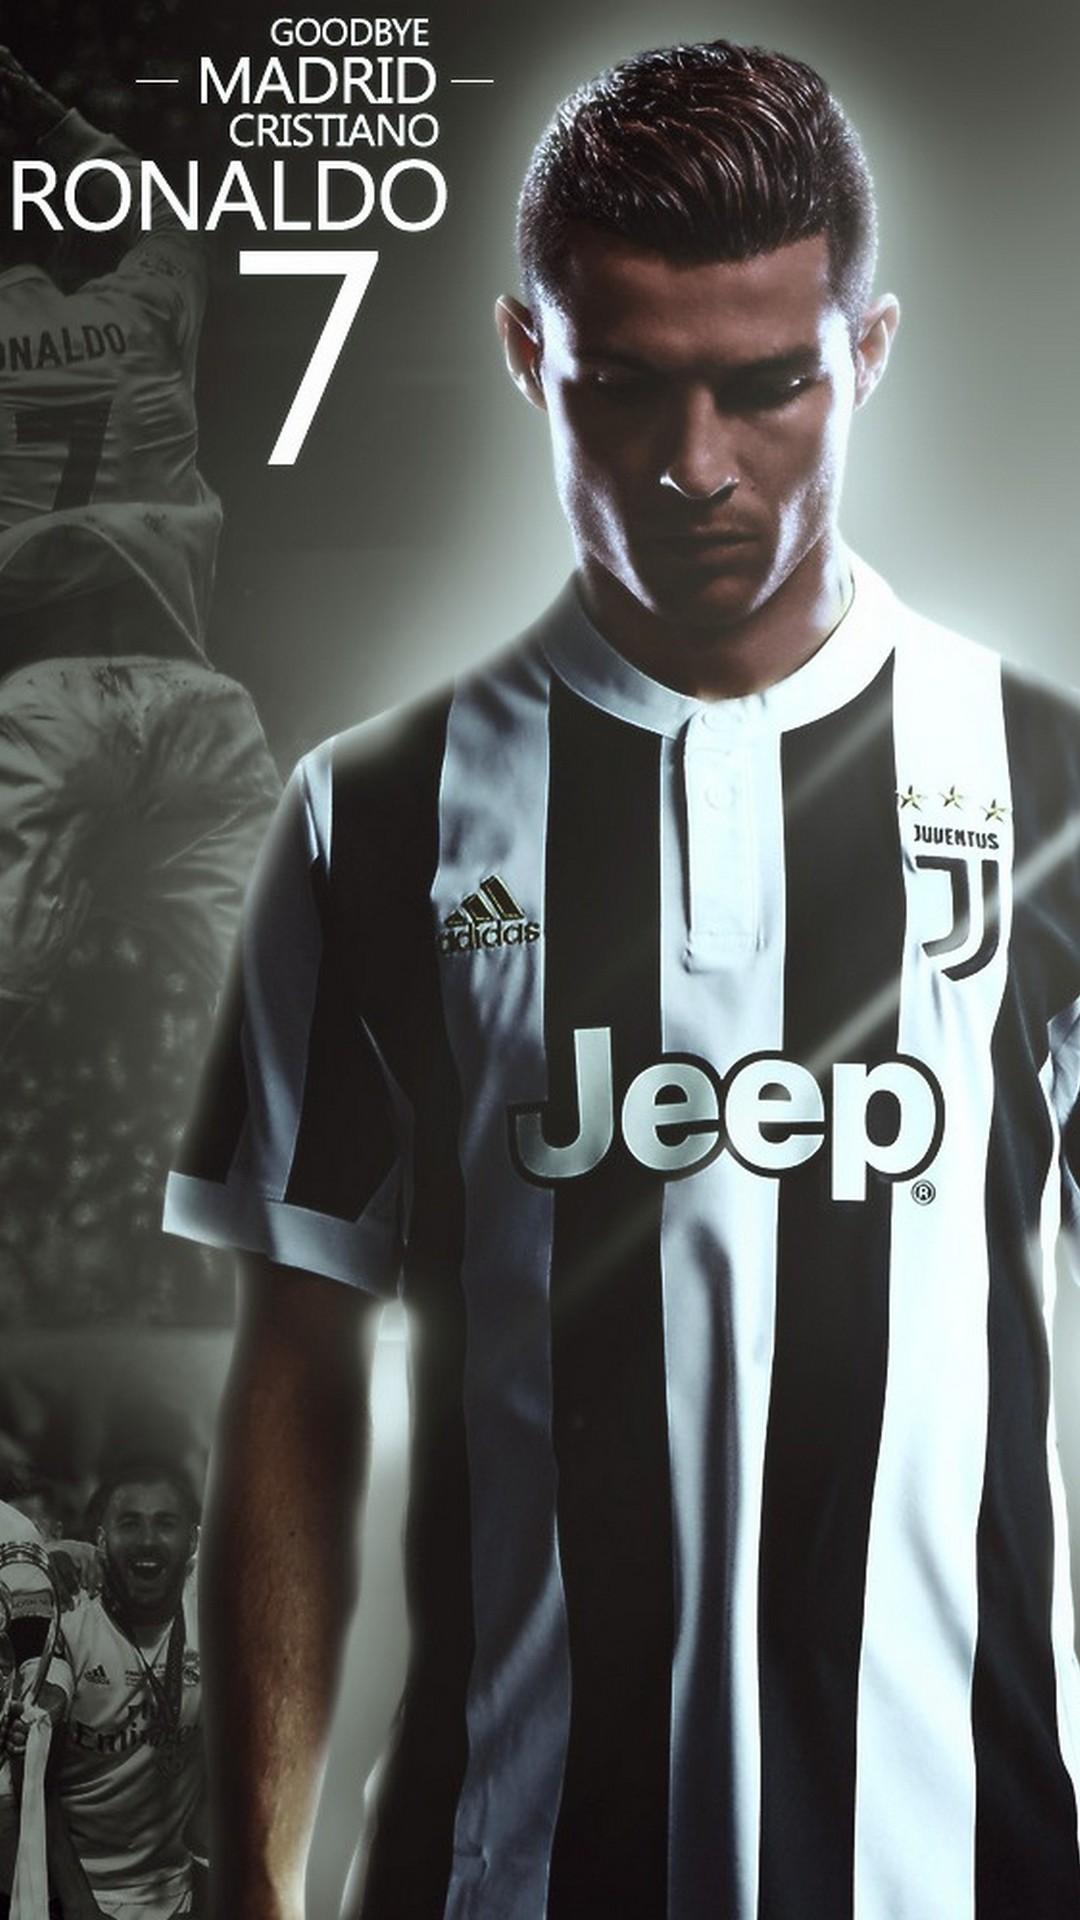 iPhone Wallpaper CR7 Juventus 2019 3D iPhone Wallpaper 1080x1920